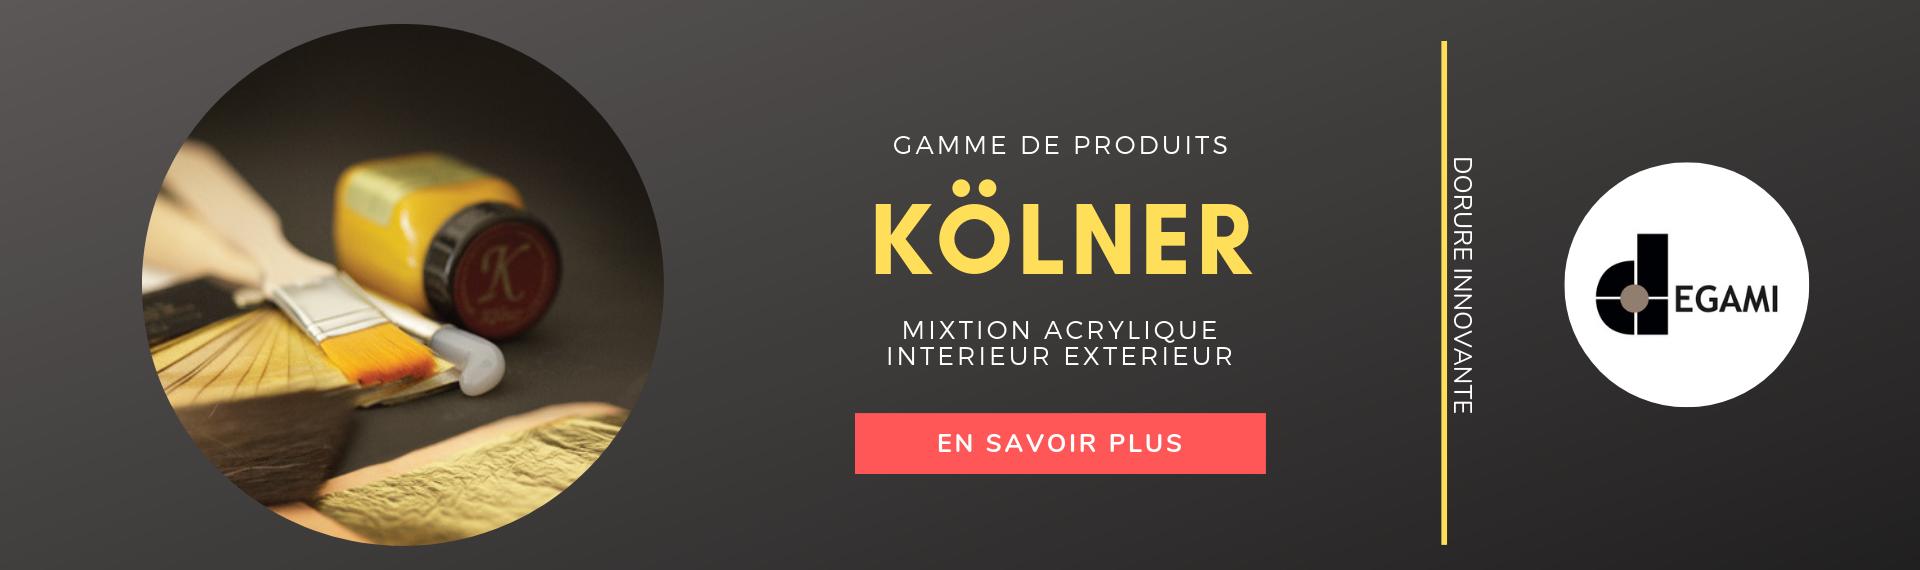 Produits Kolner Innovation Dorure